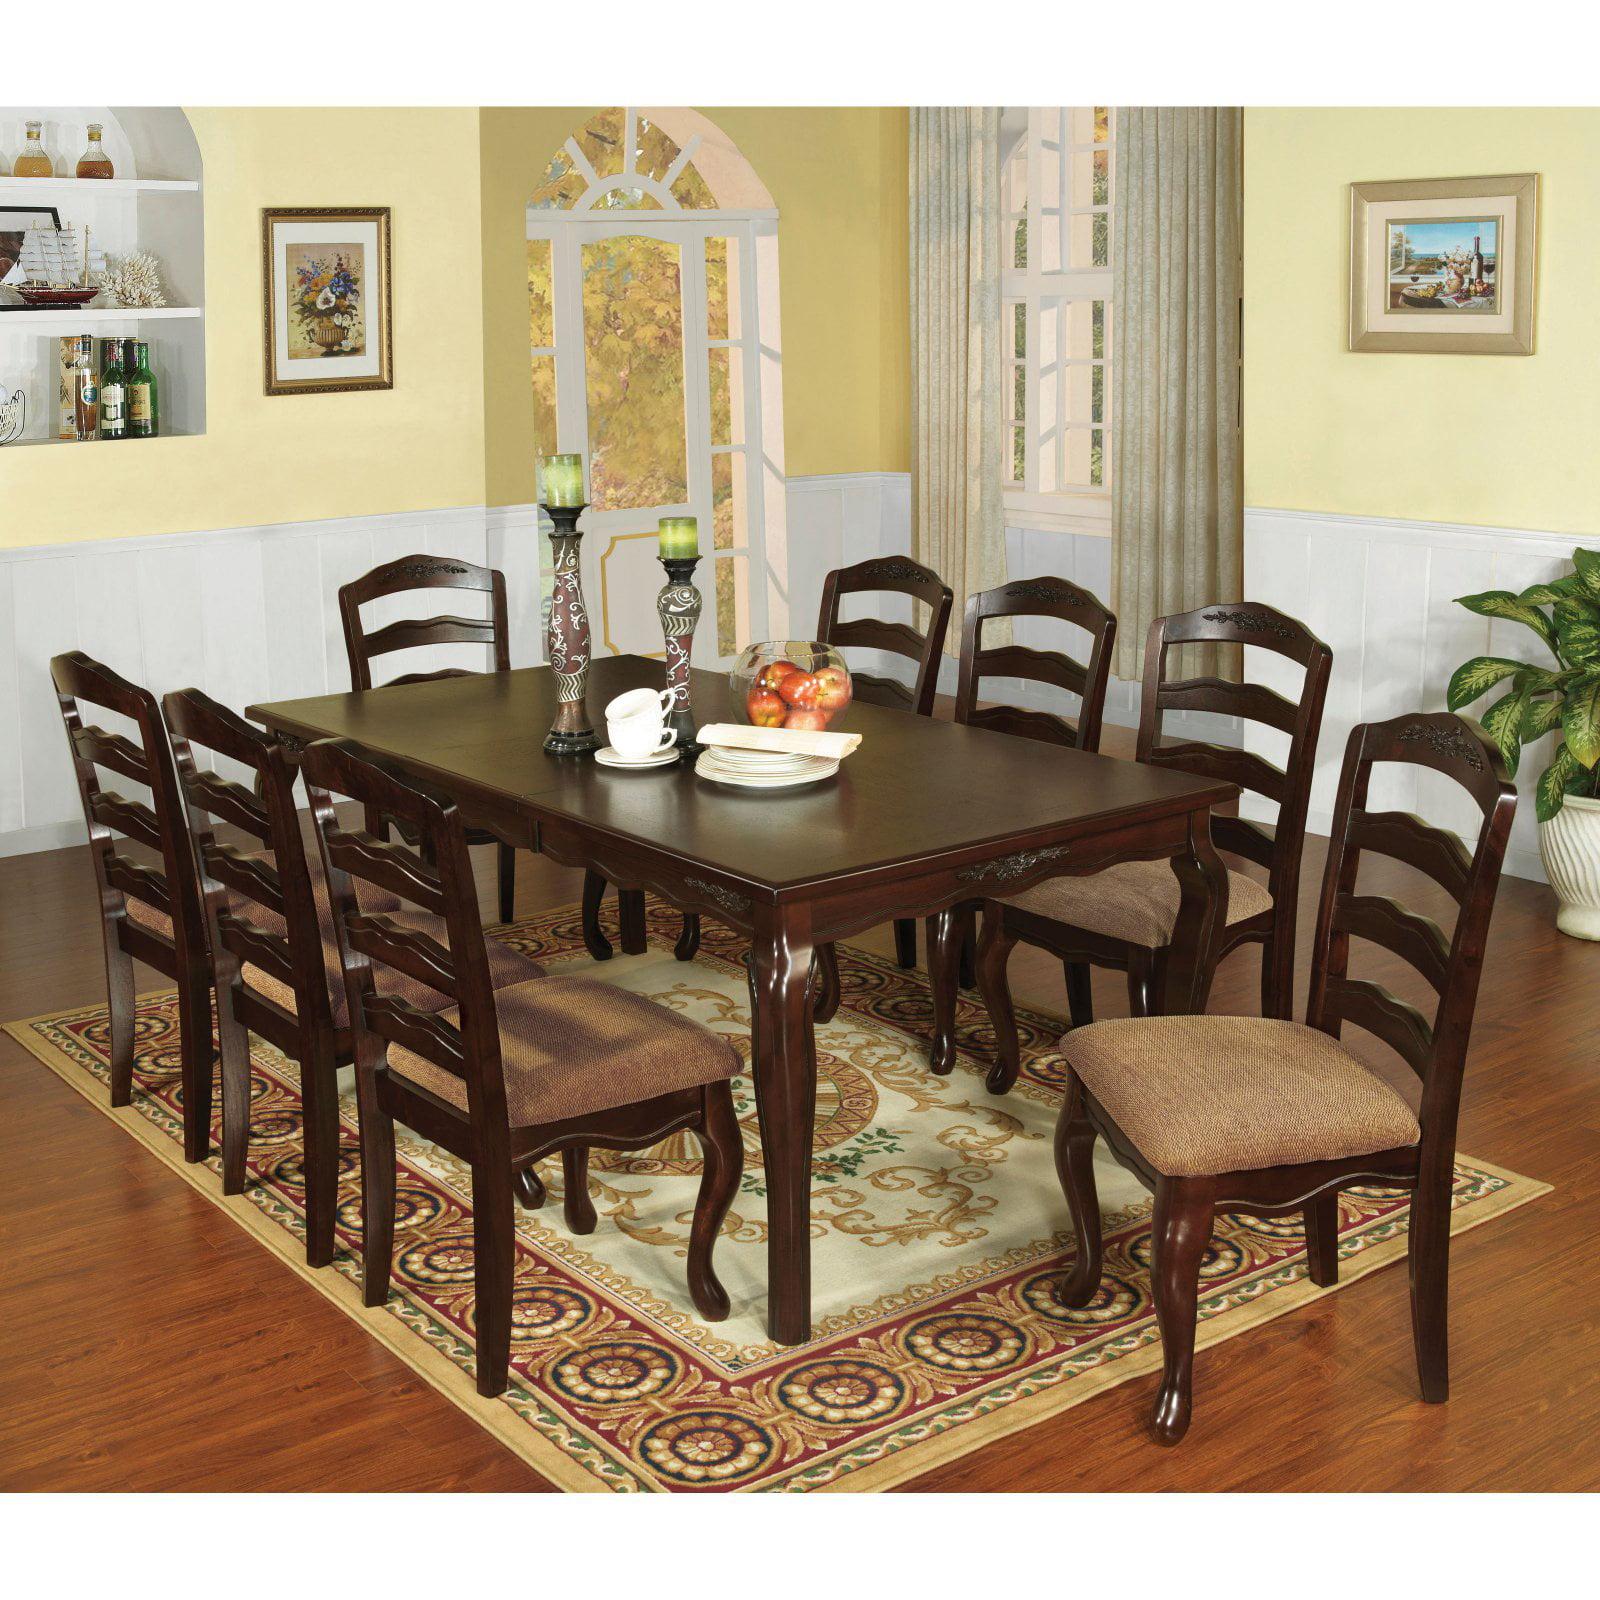 Furniture of America Hadriana 9 Piece Dining Set